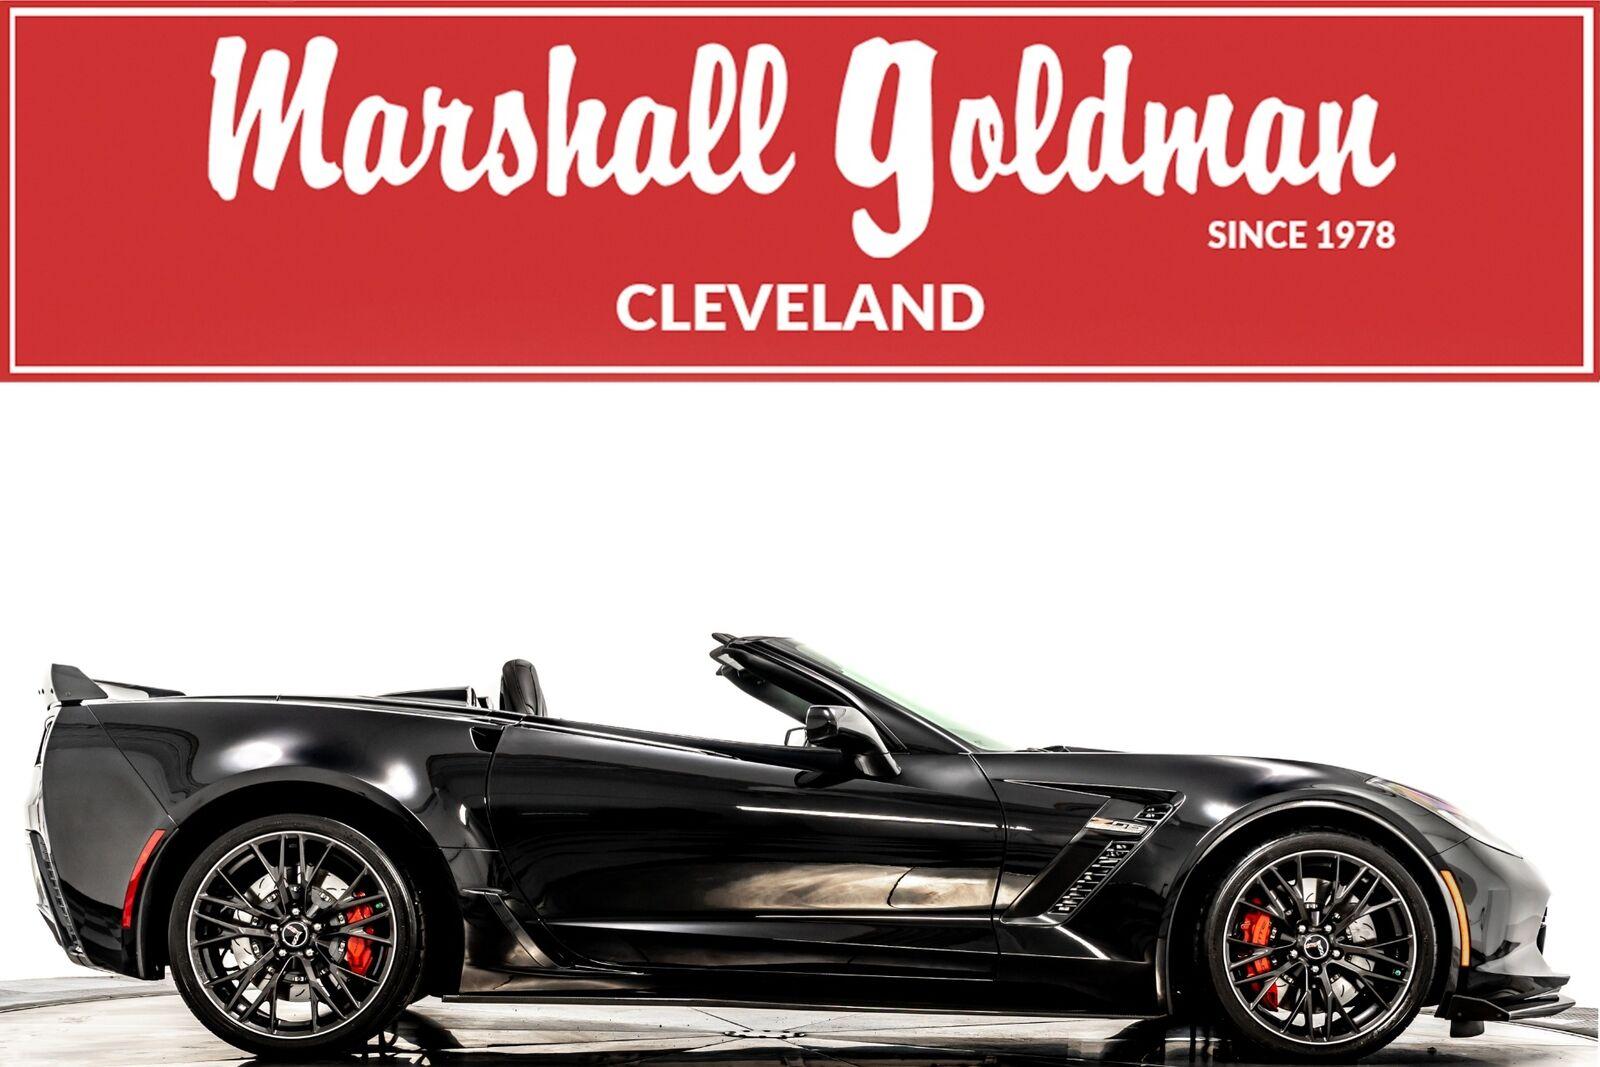 2015 Black Chevrolet Corvette Z06 3LZ   C7 Corvette Photo 1